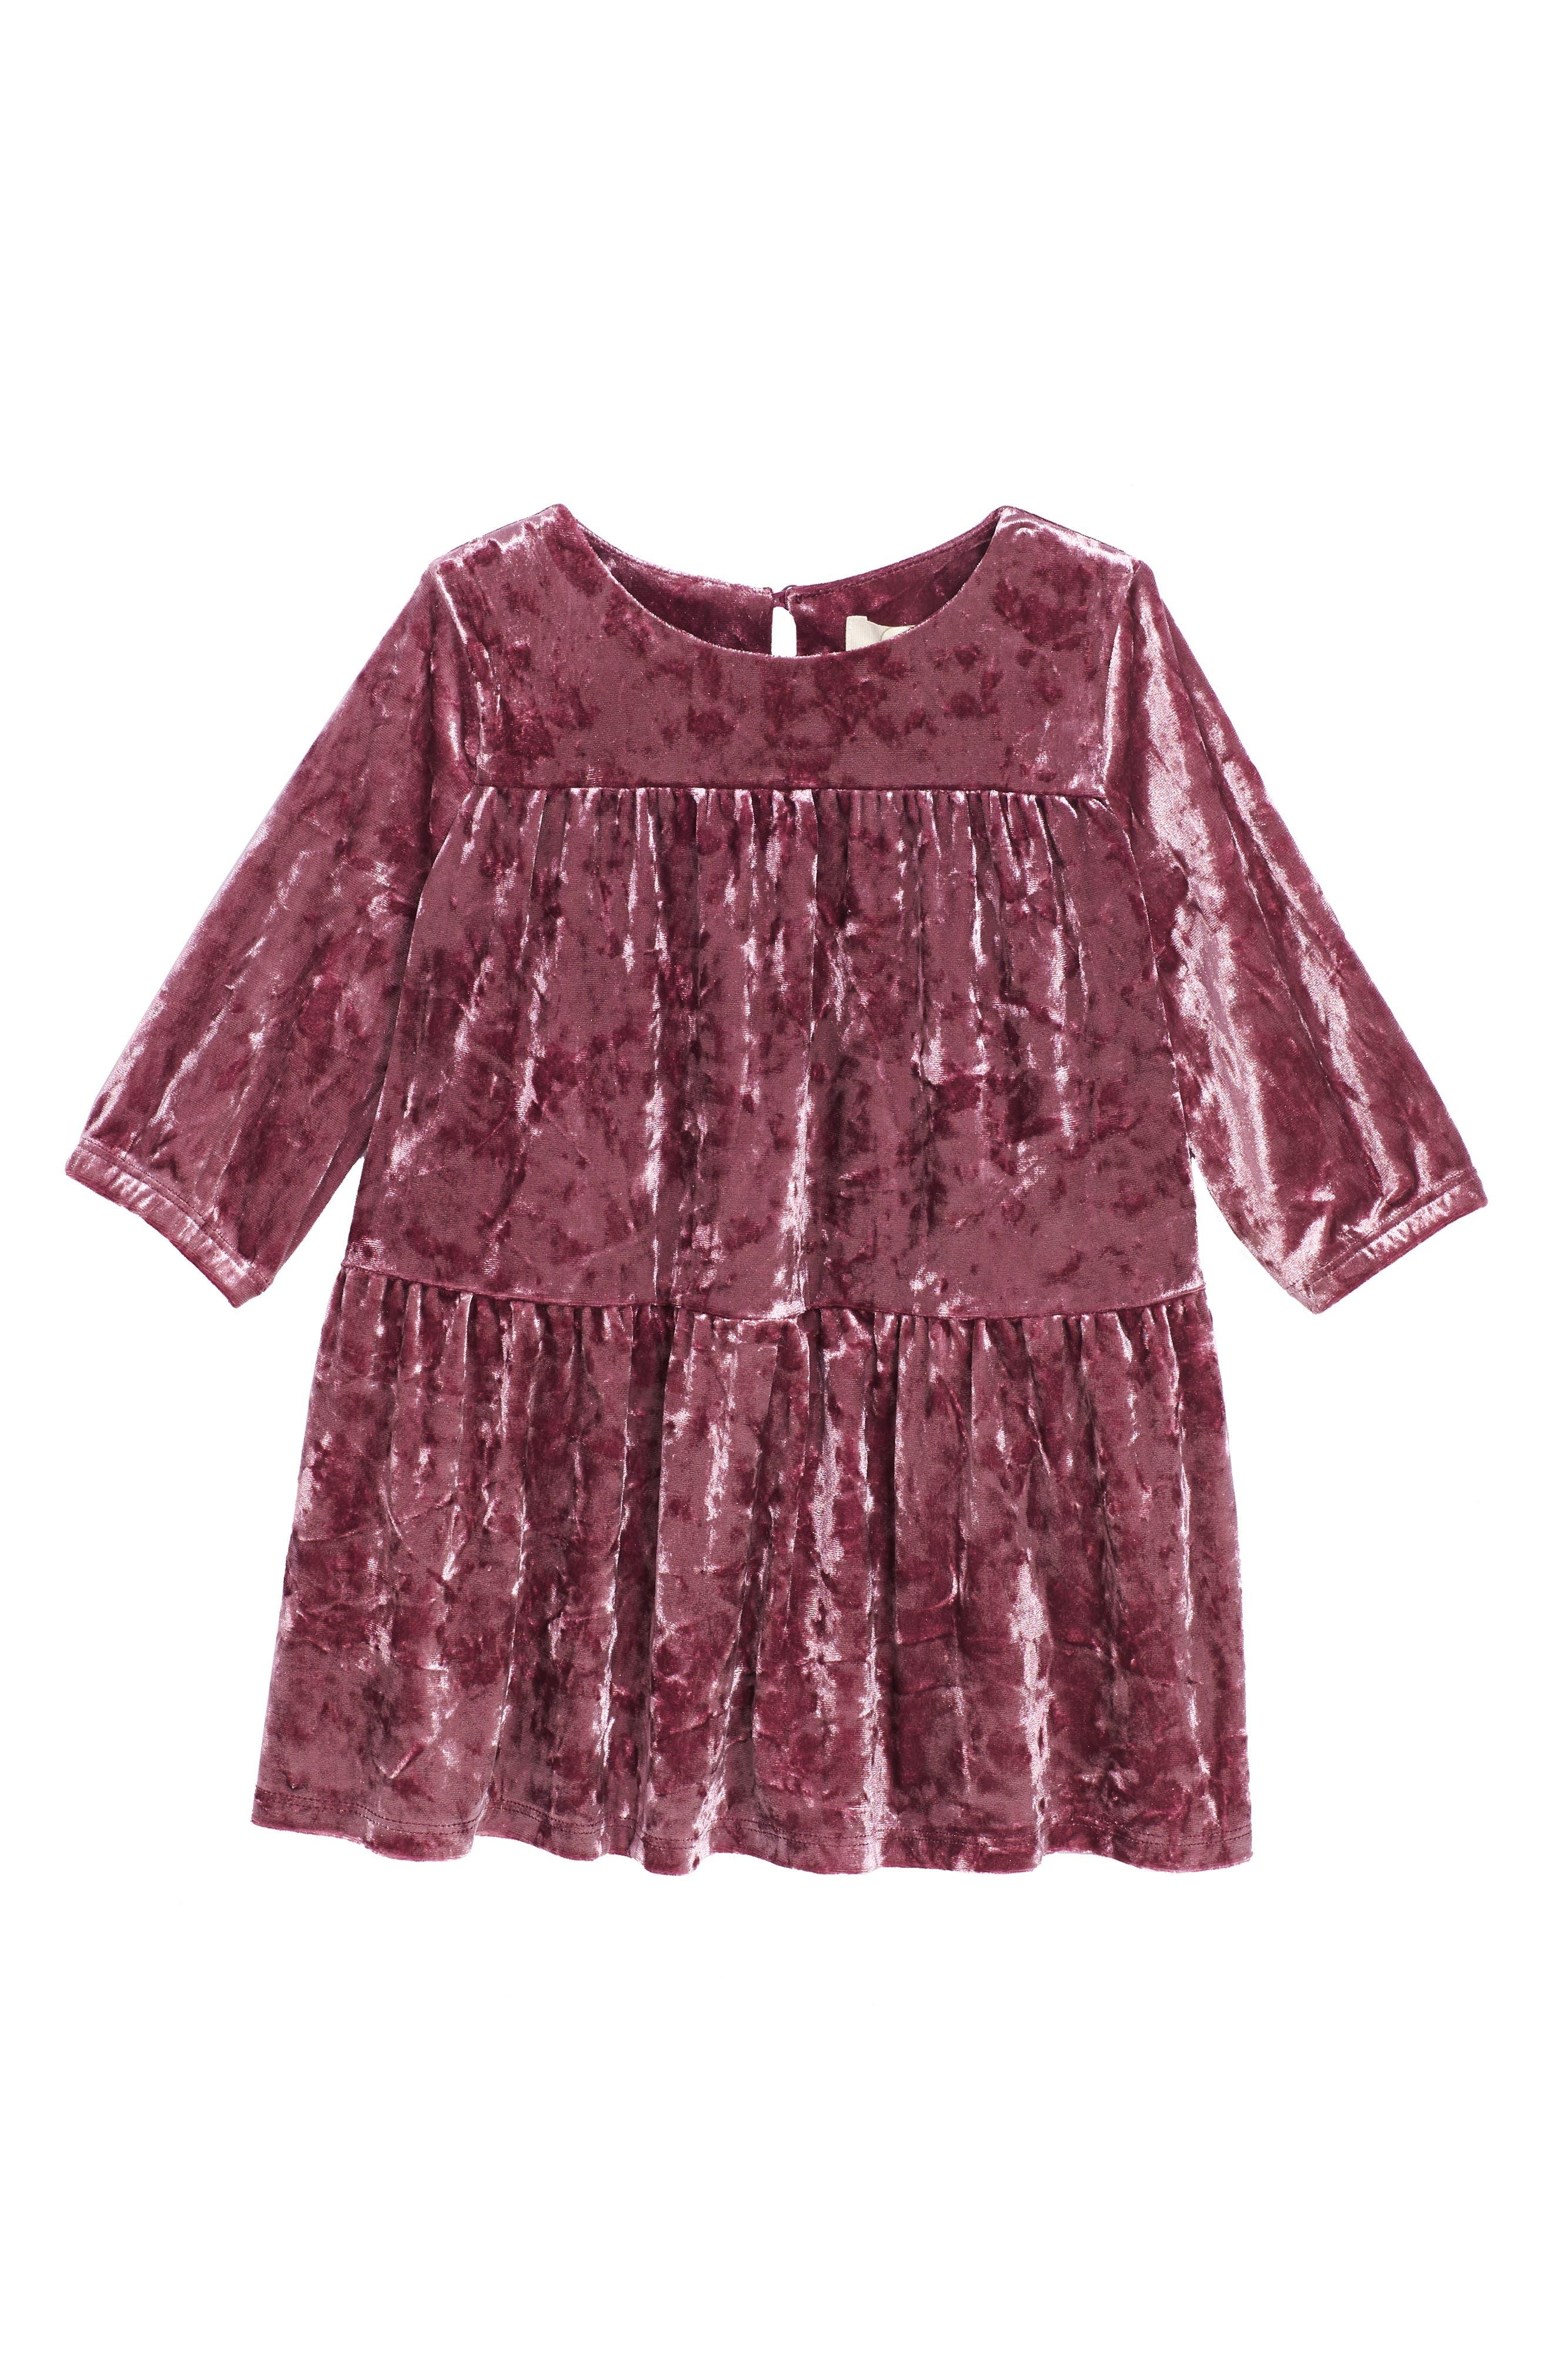 Main Image - Peek Jasmine Dress (Toddler Girls, Little Girls & Big Girls)